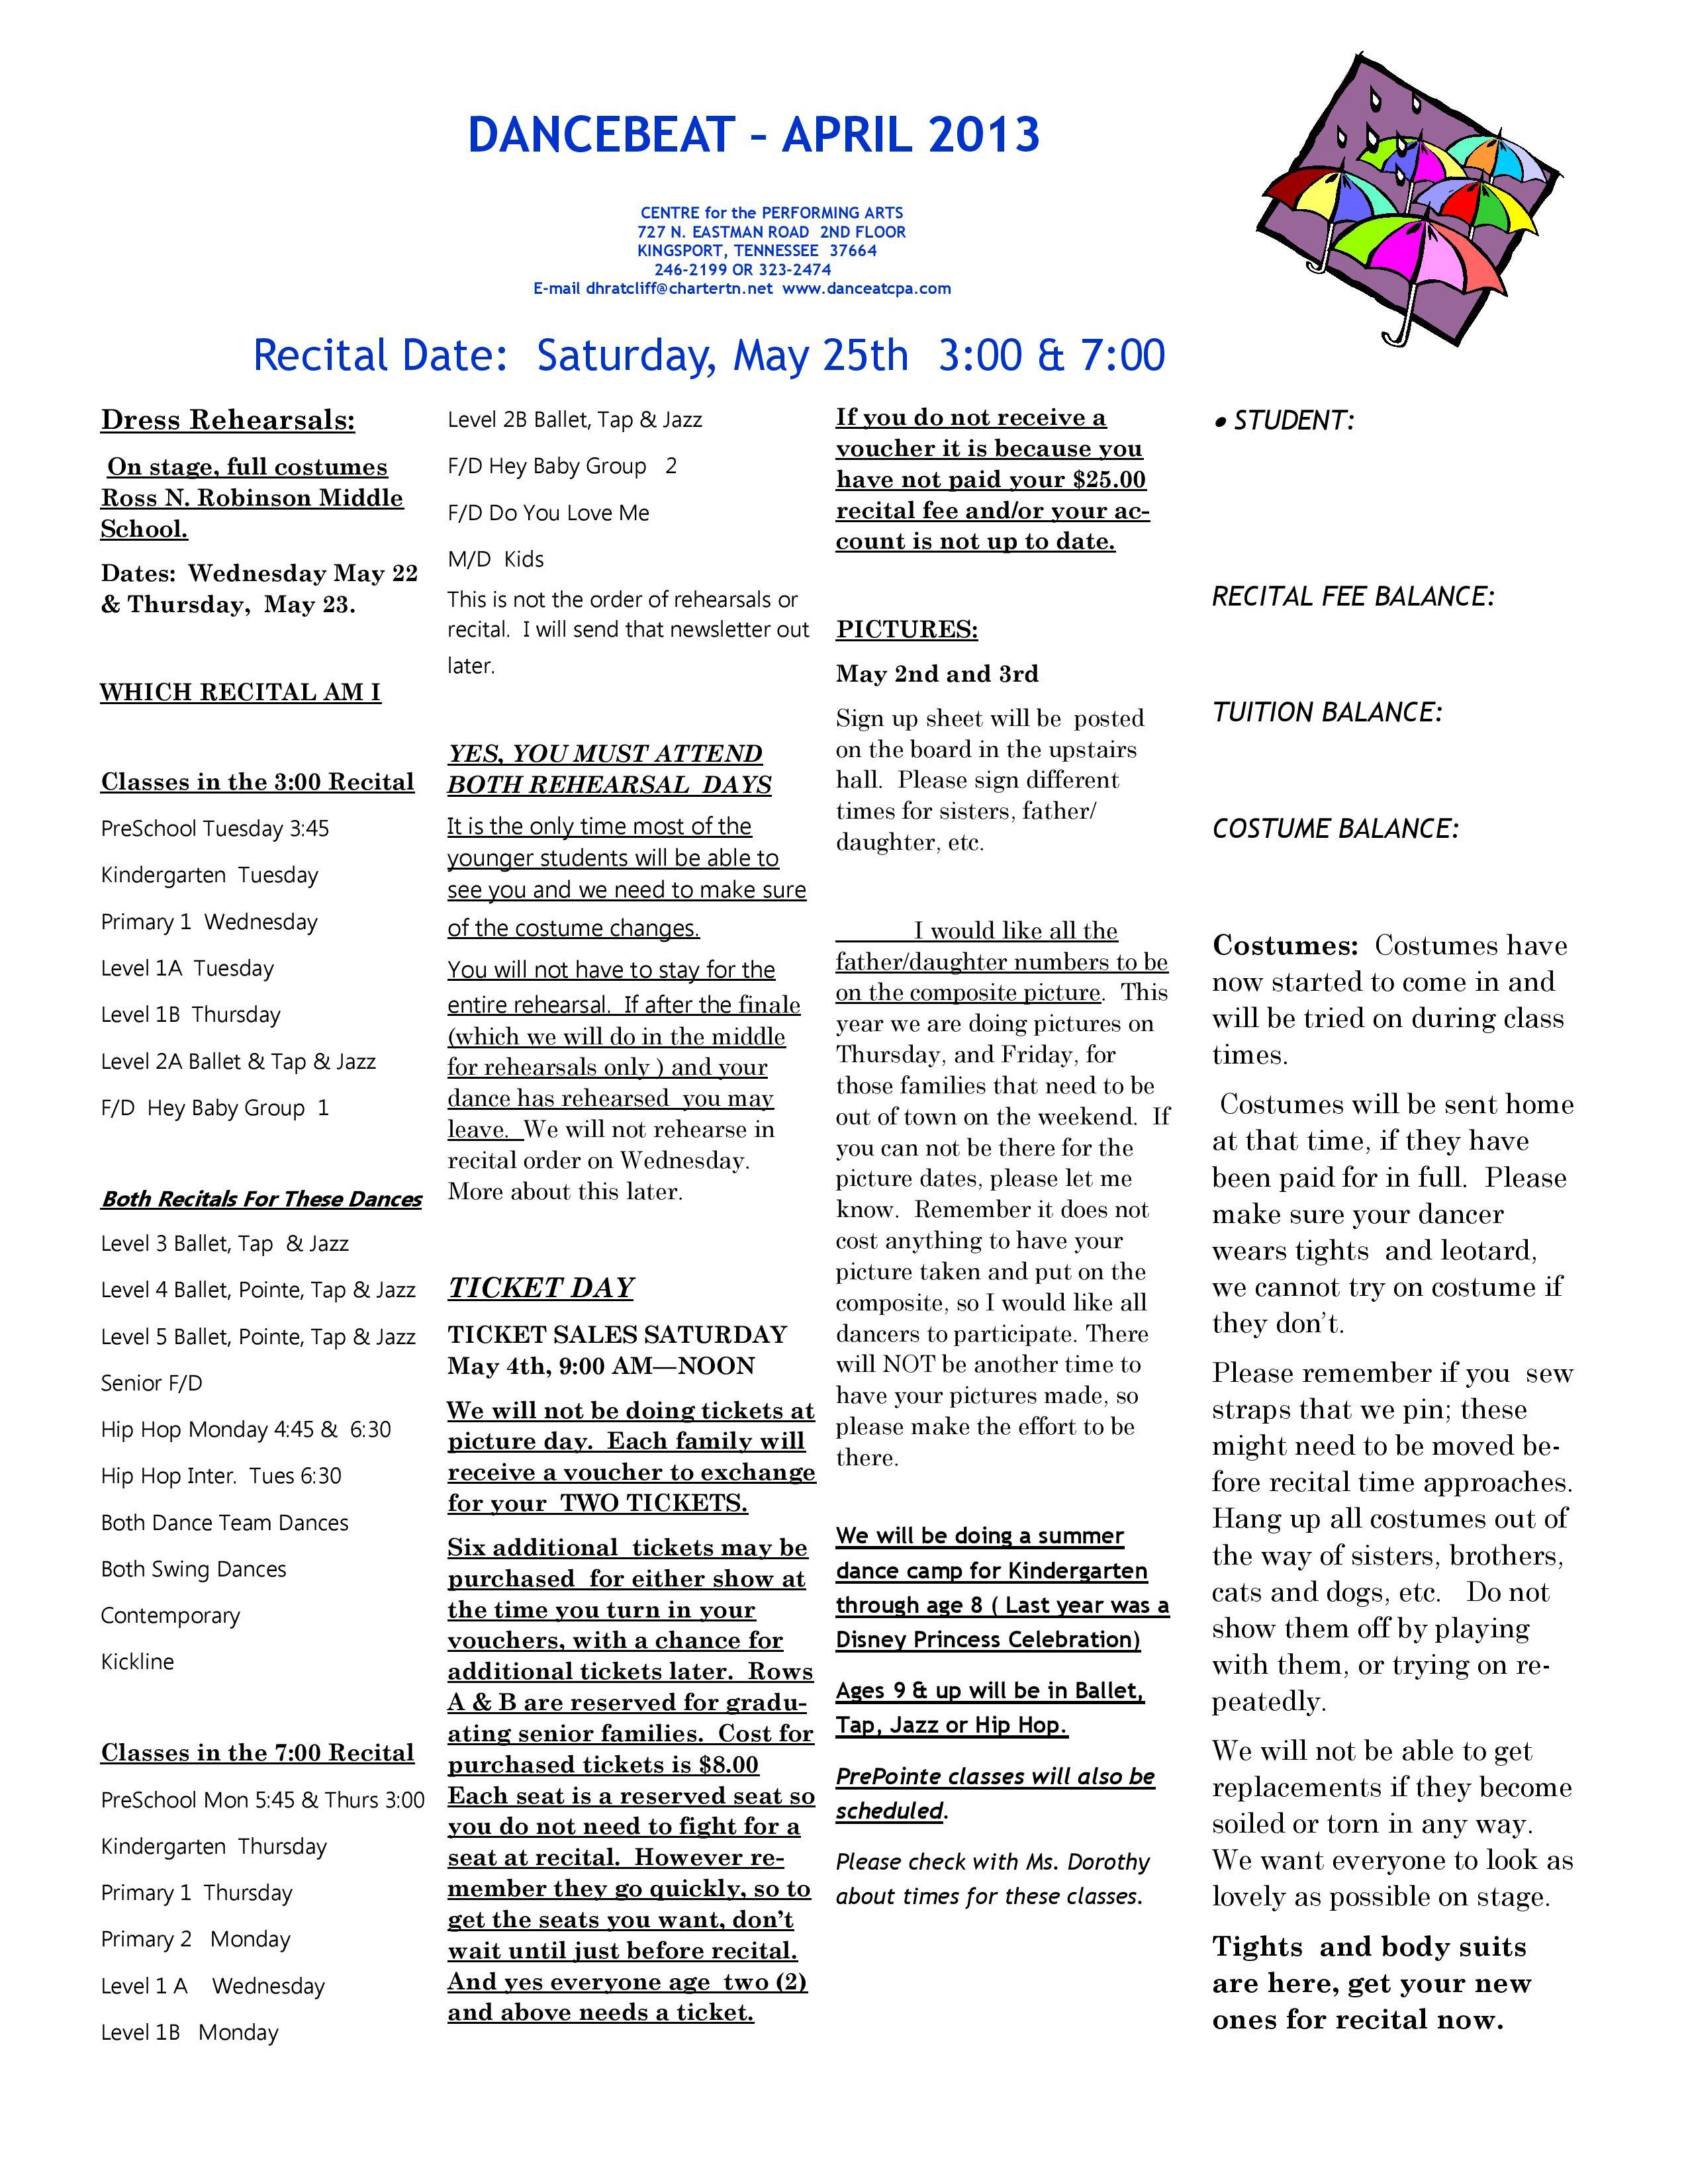 April dancbeat 2013-page-001